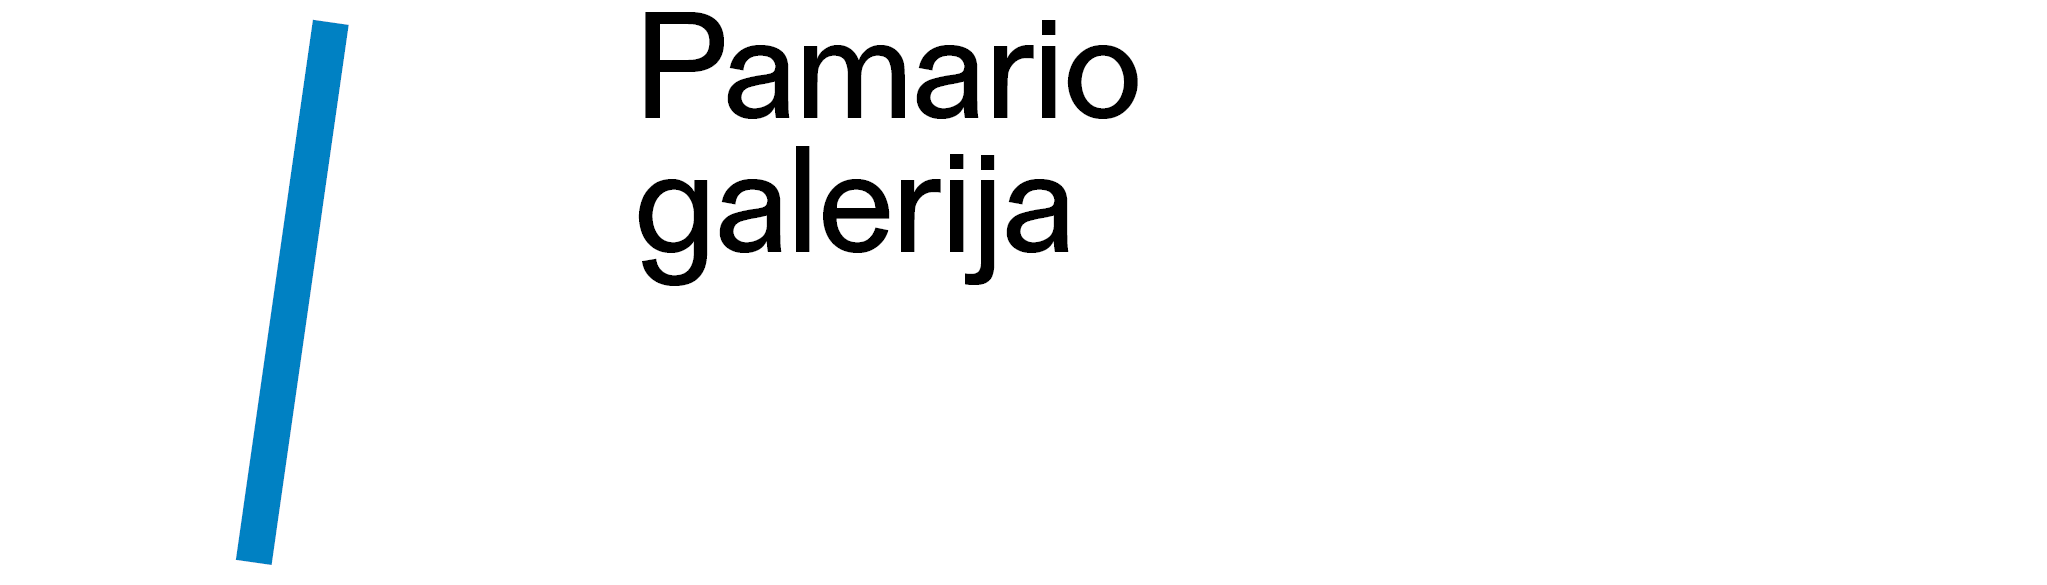 Pamario galerija